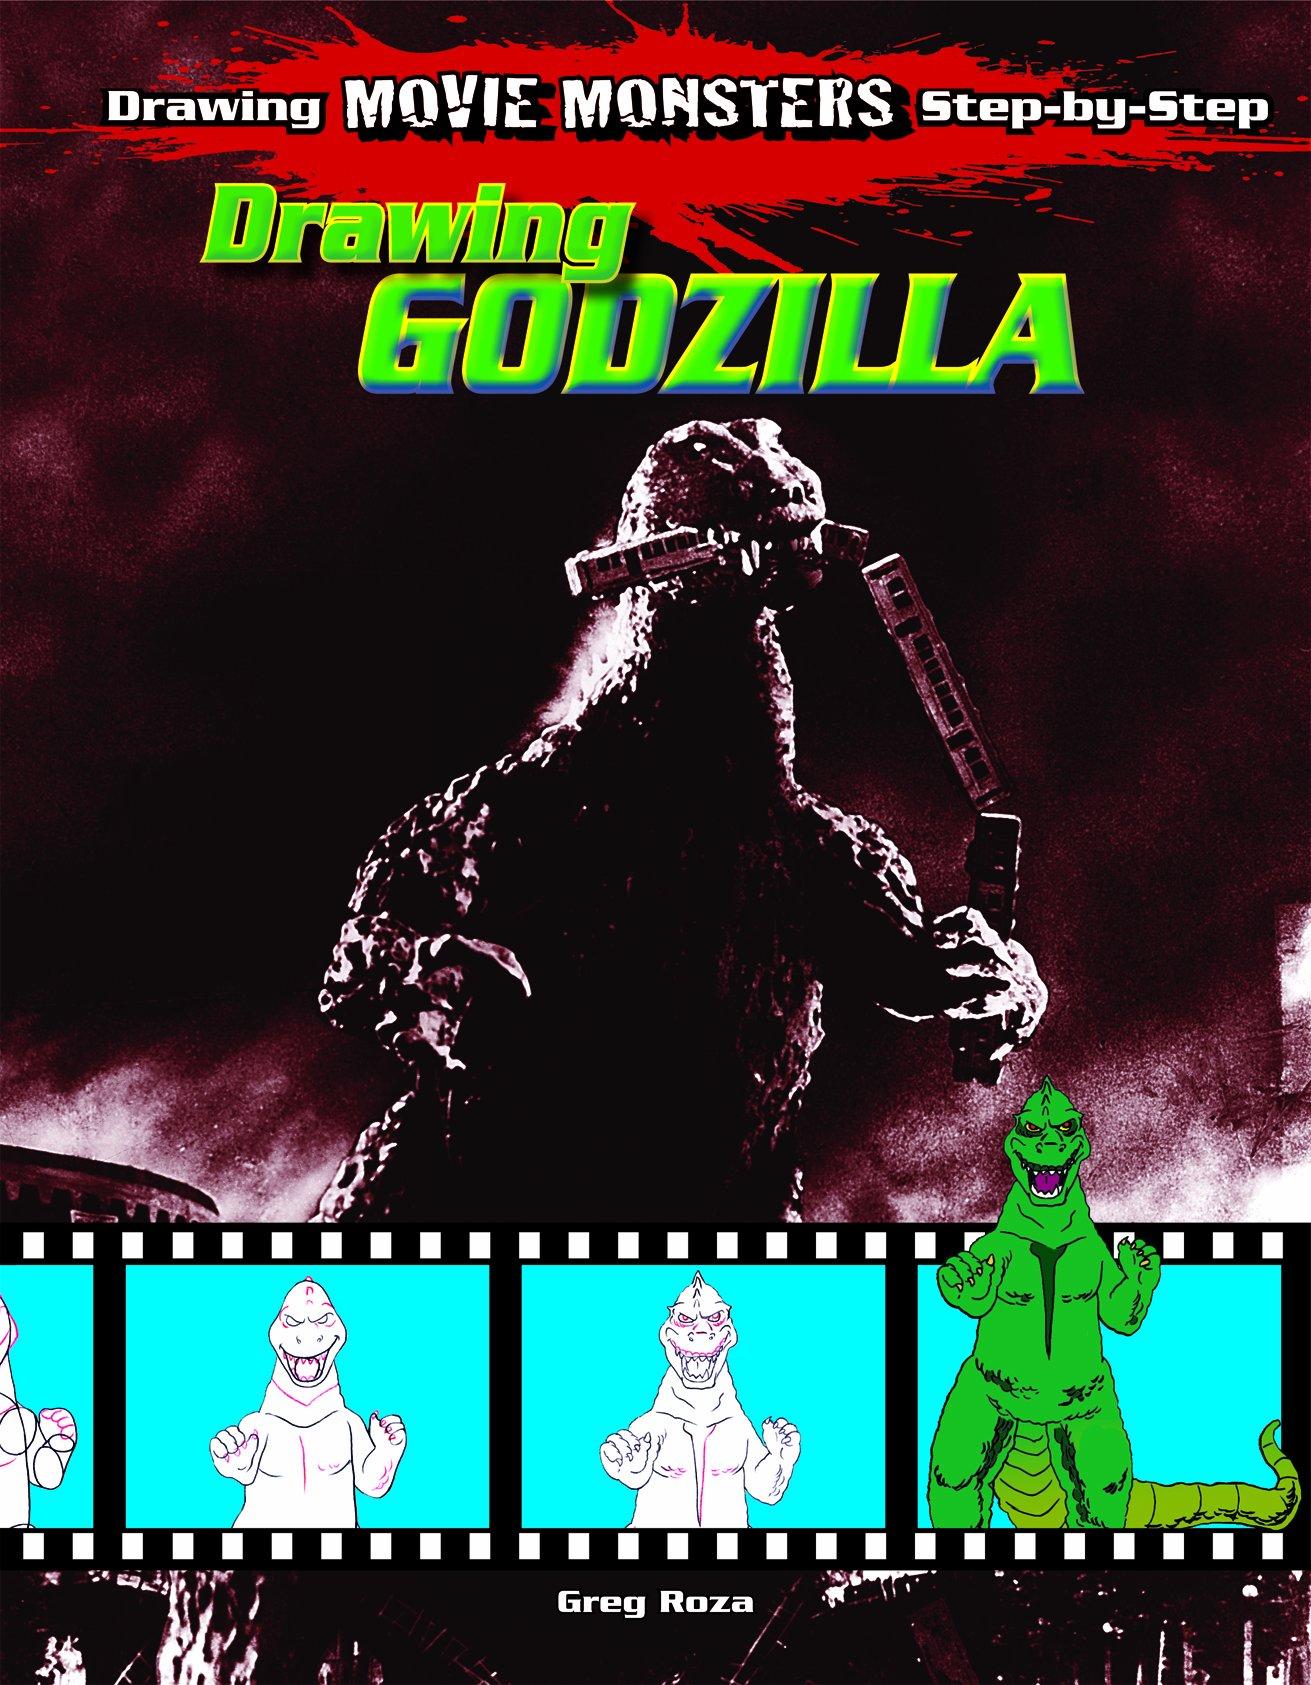 Drawing Godzilla Drawing Movie Monsters Step By Step Roza Greg 9781615330133 Amazon Com Books